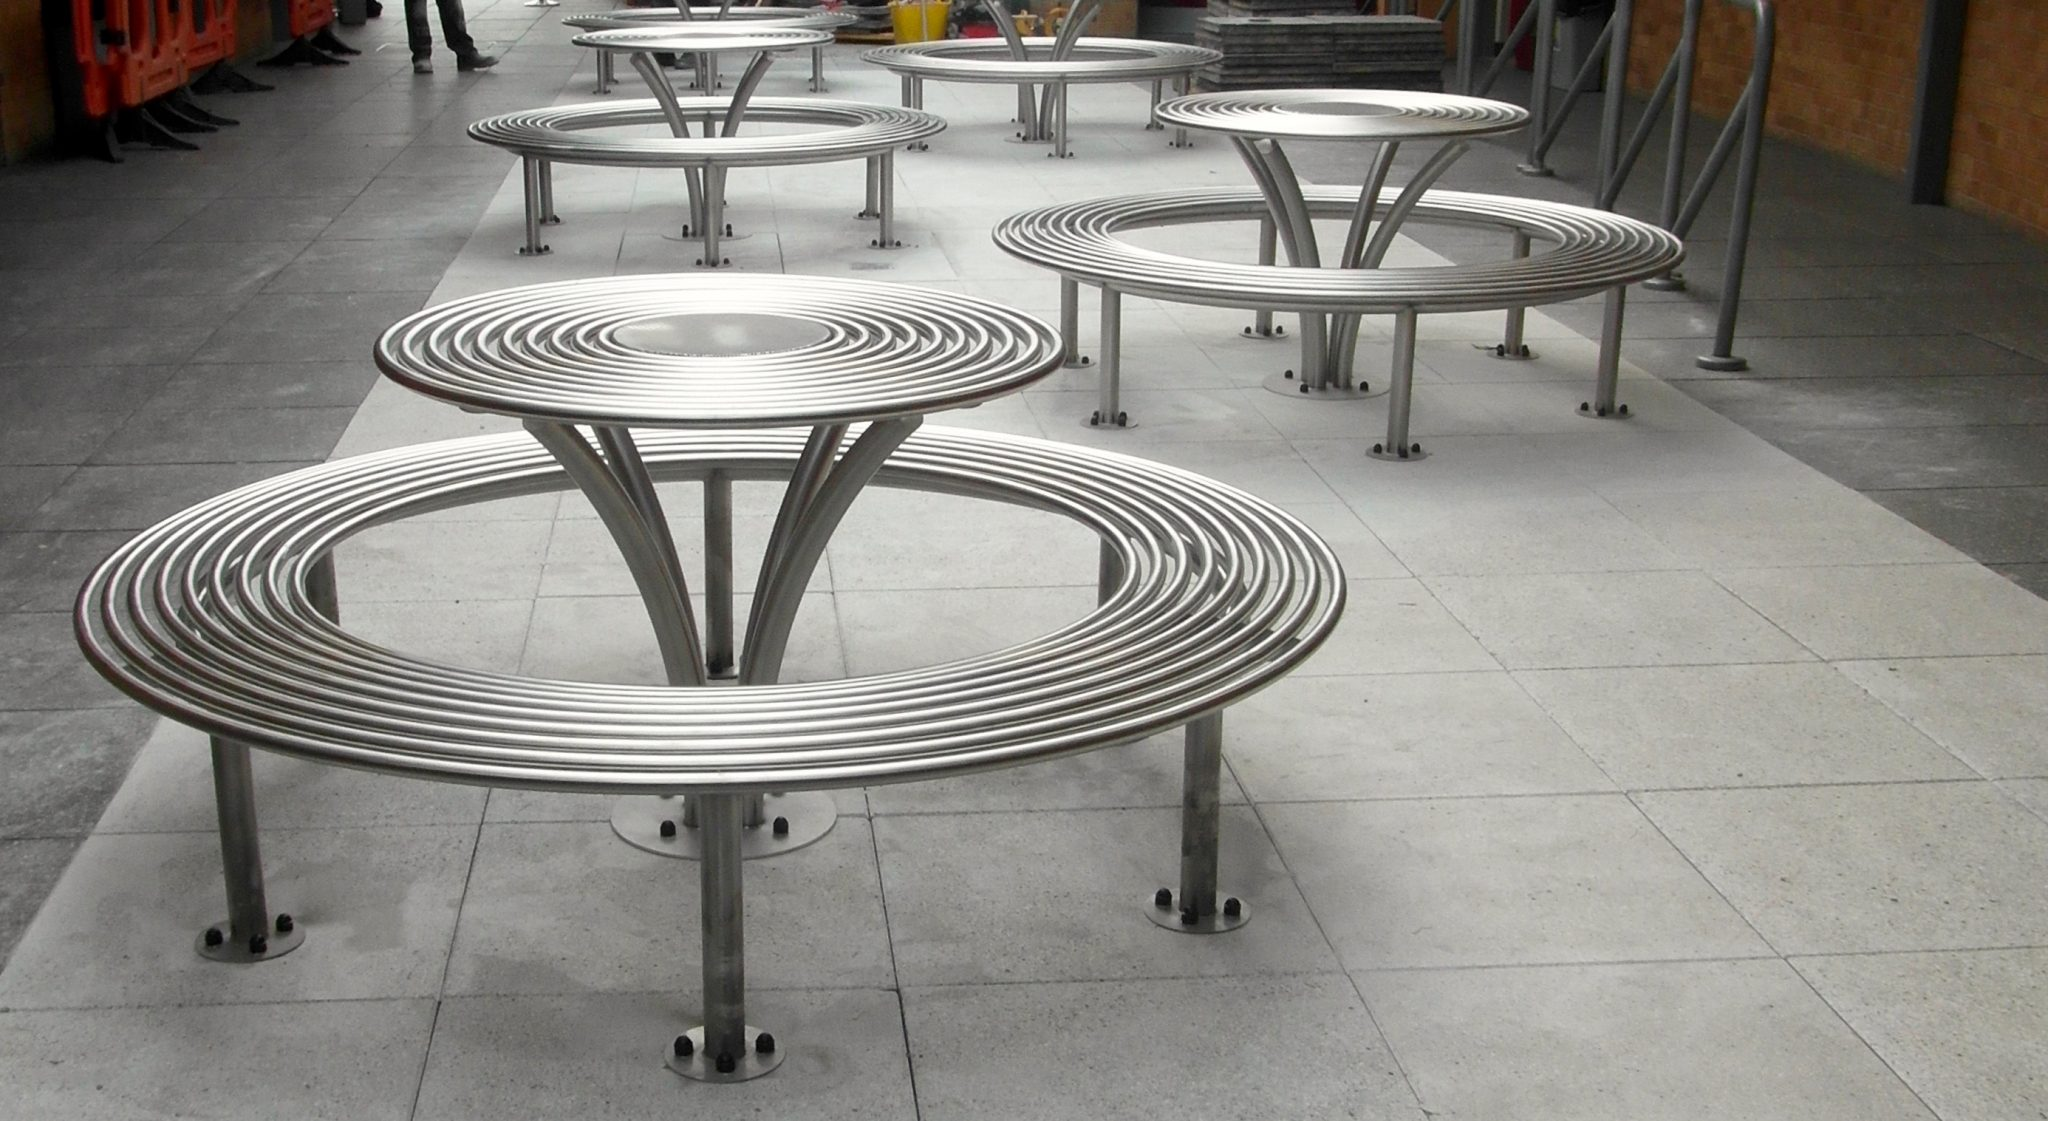 Bl027 picnic table benchmark street furniture for Decor stainless international co ltd